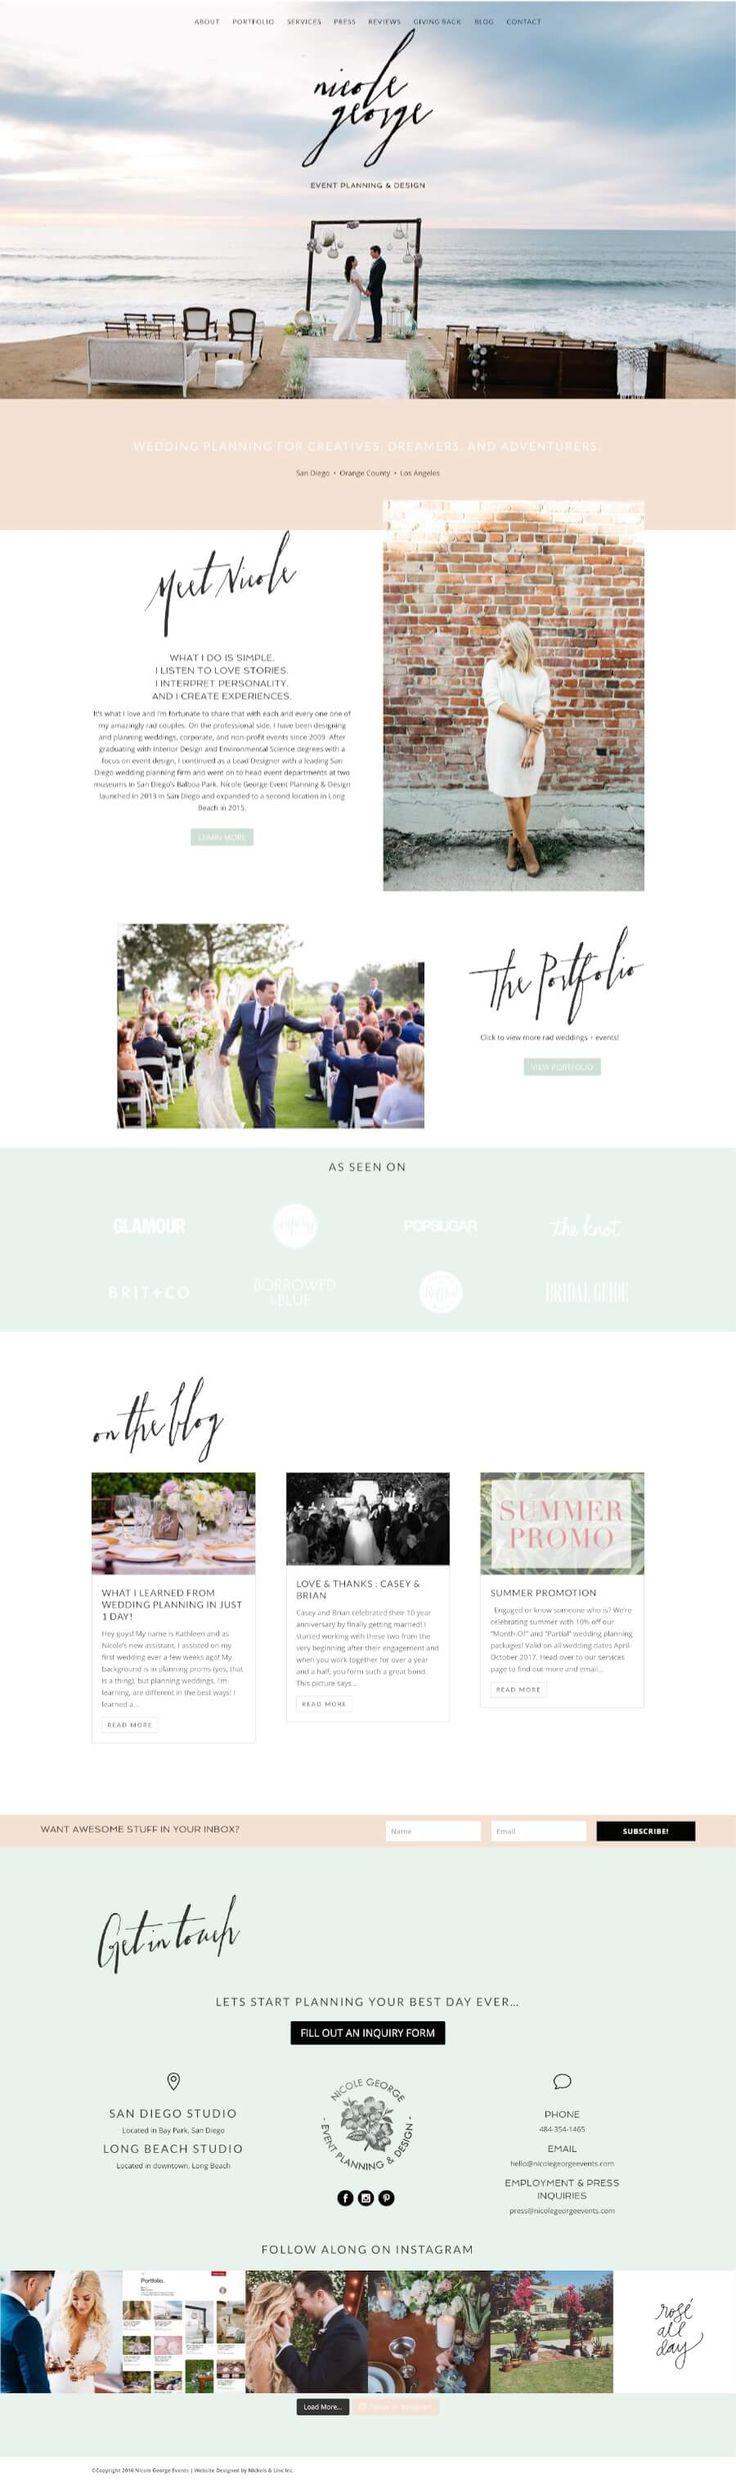 wedding planner website design.  Nicole George Events.  Designed by Nickels & Linc Inc.